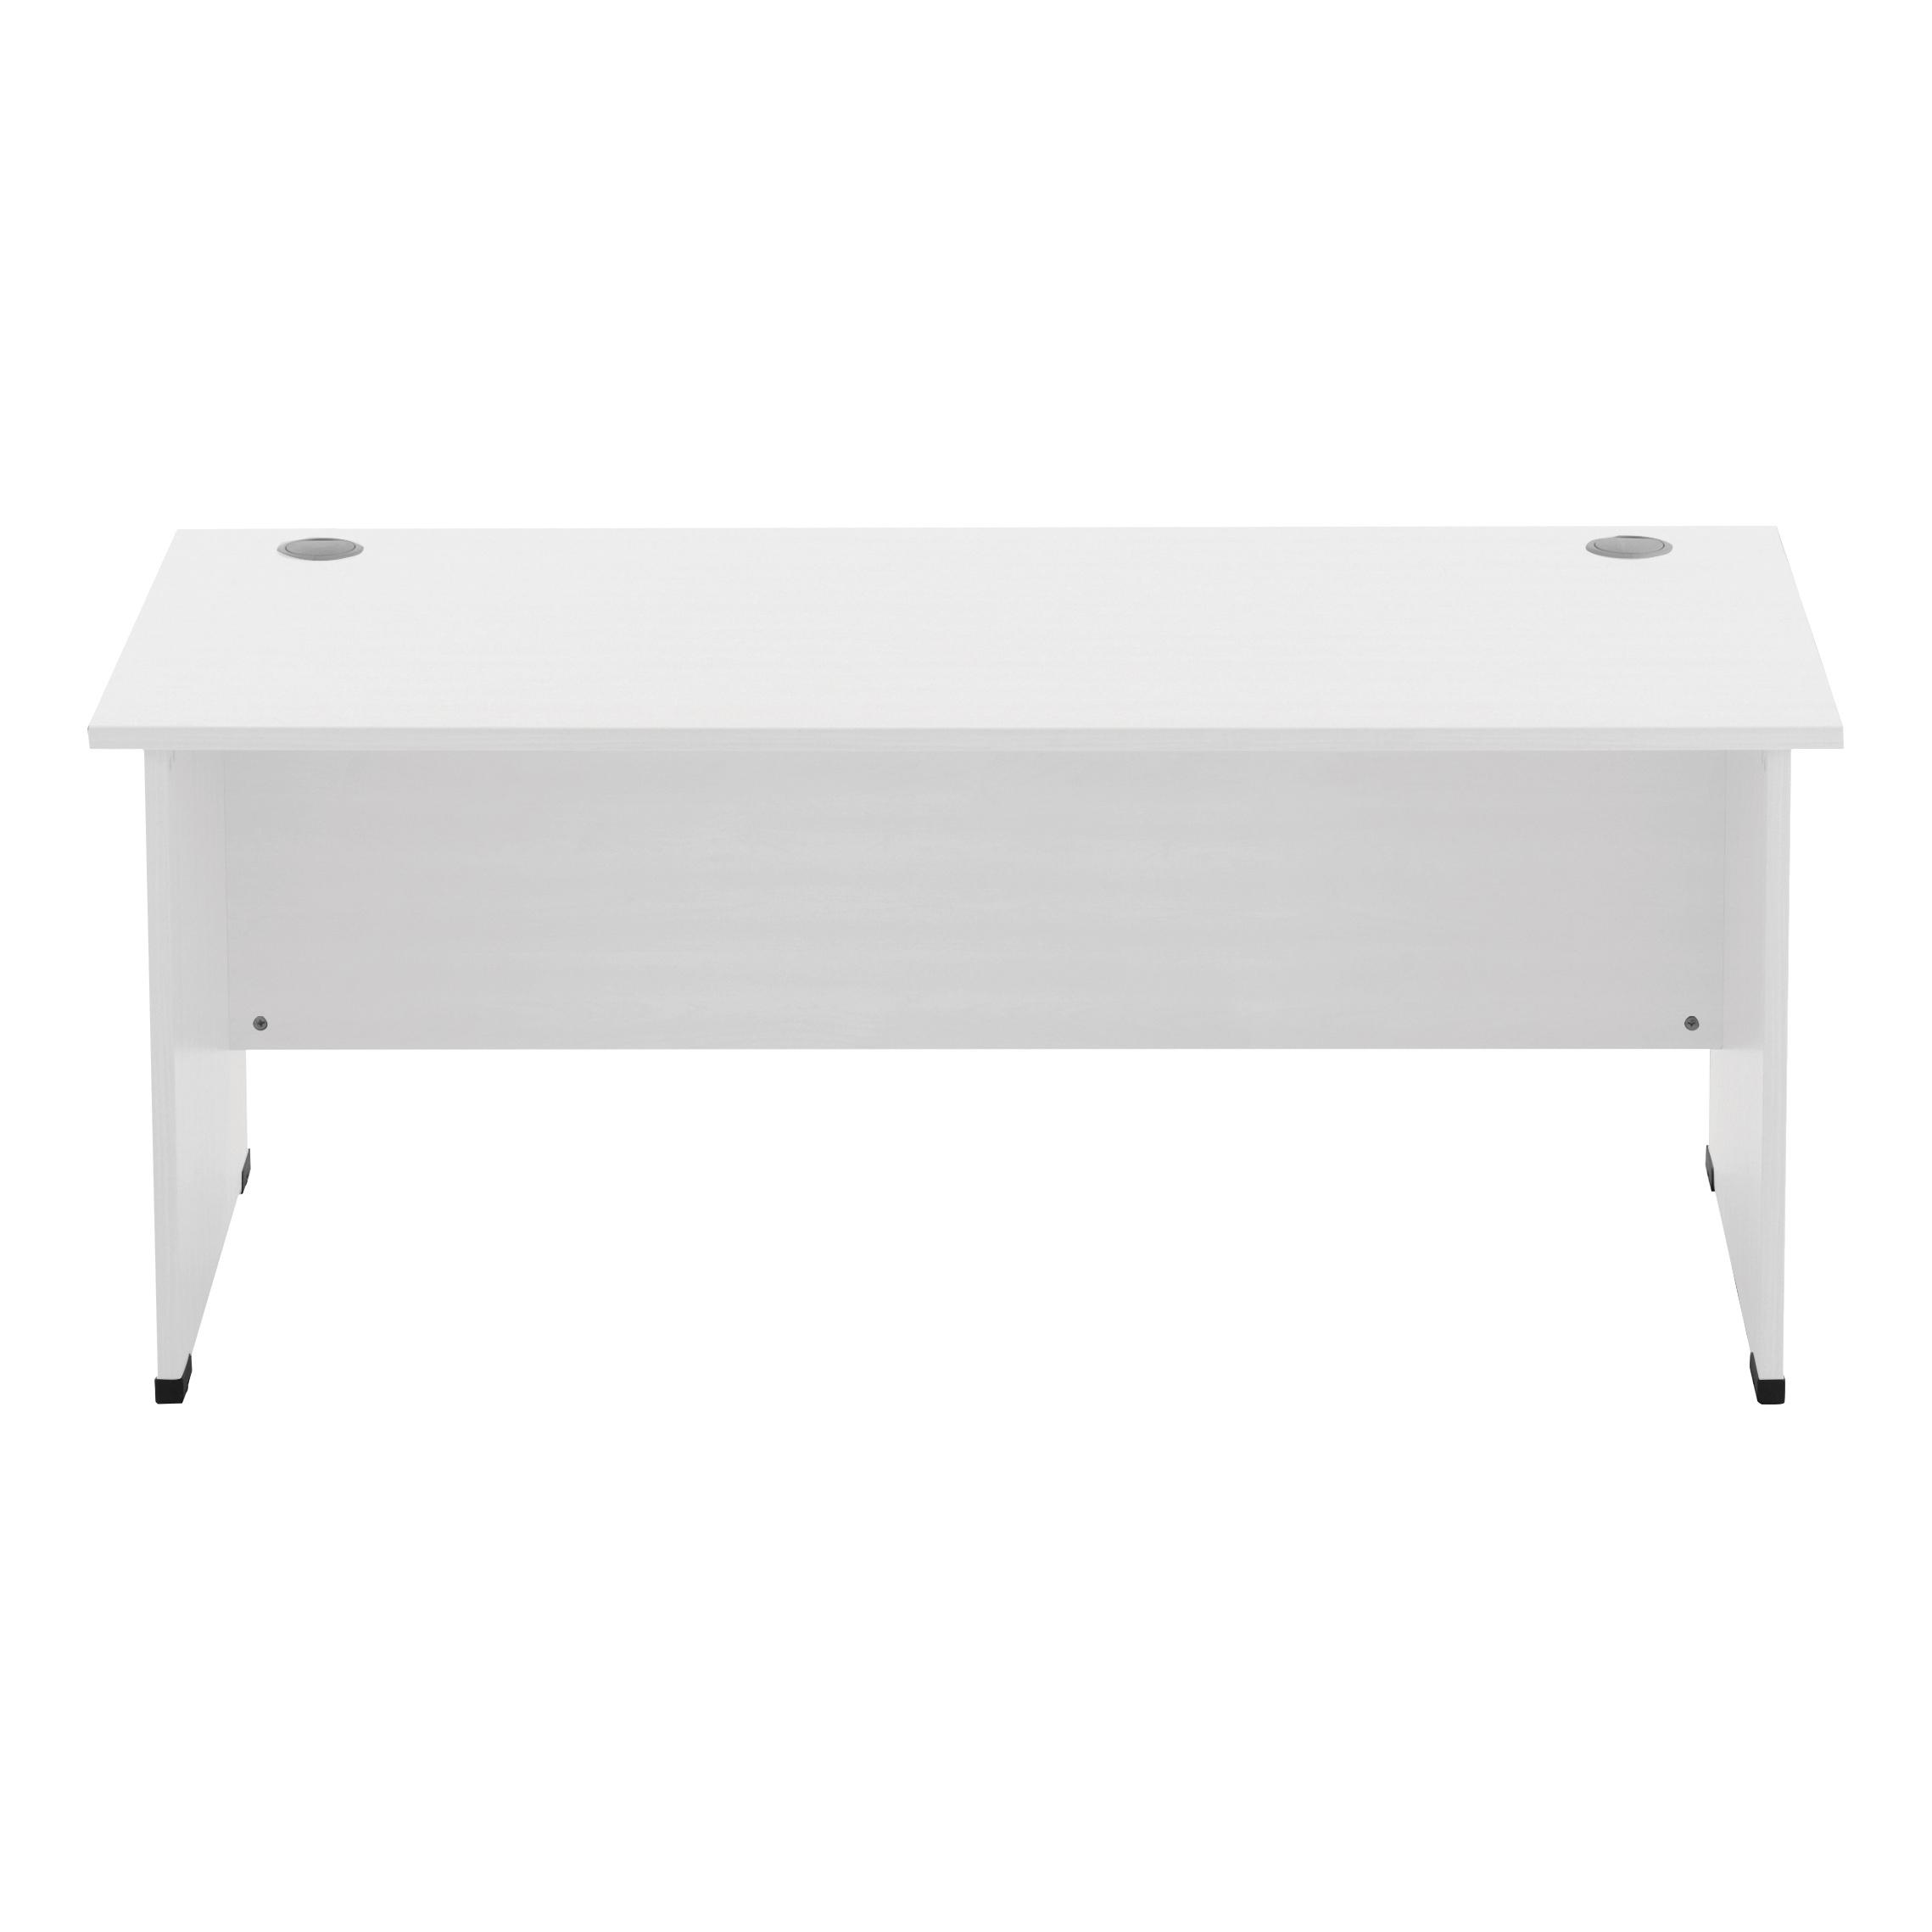 Desks Sonix Rectangular Desk Panel End Leg 1800x800mm Polar White Ref w9405wh